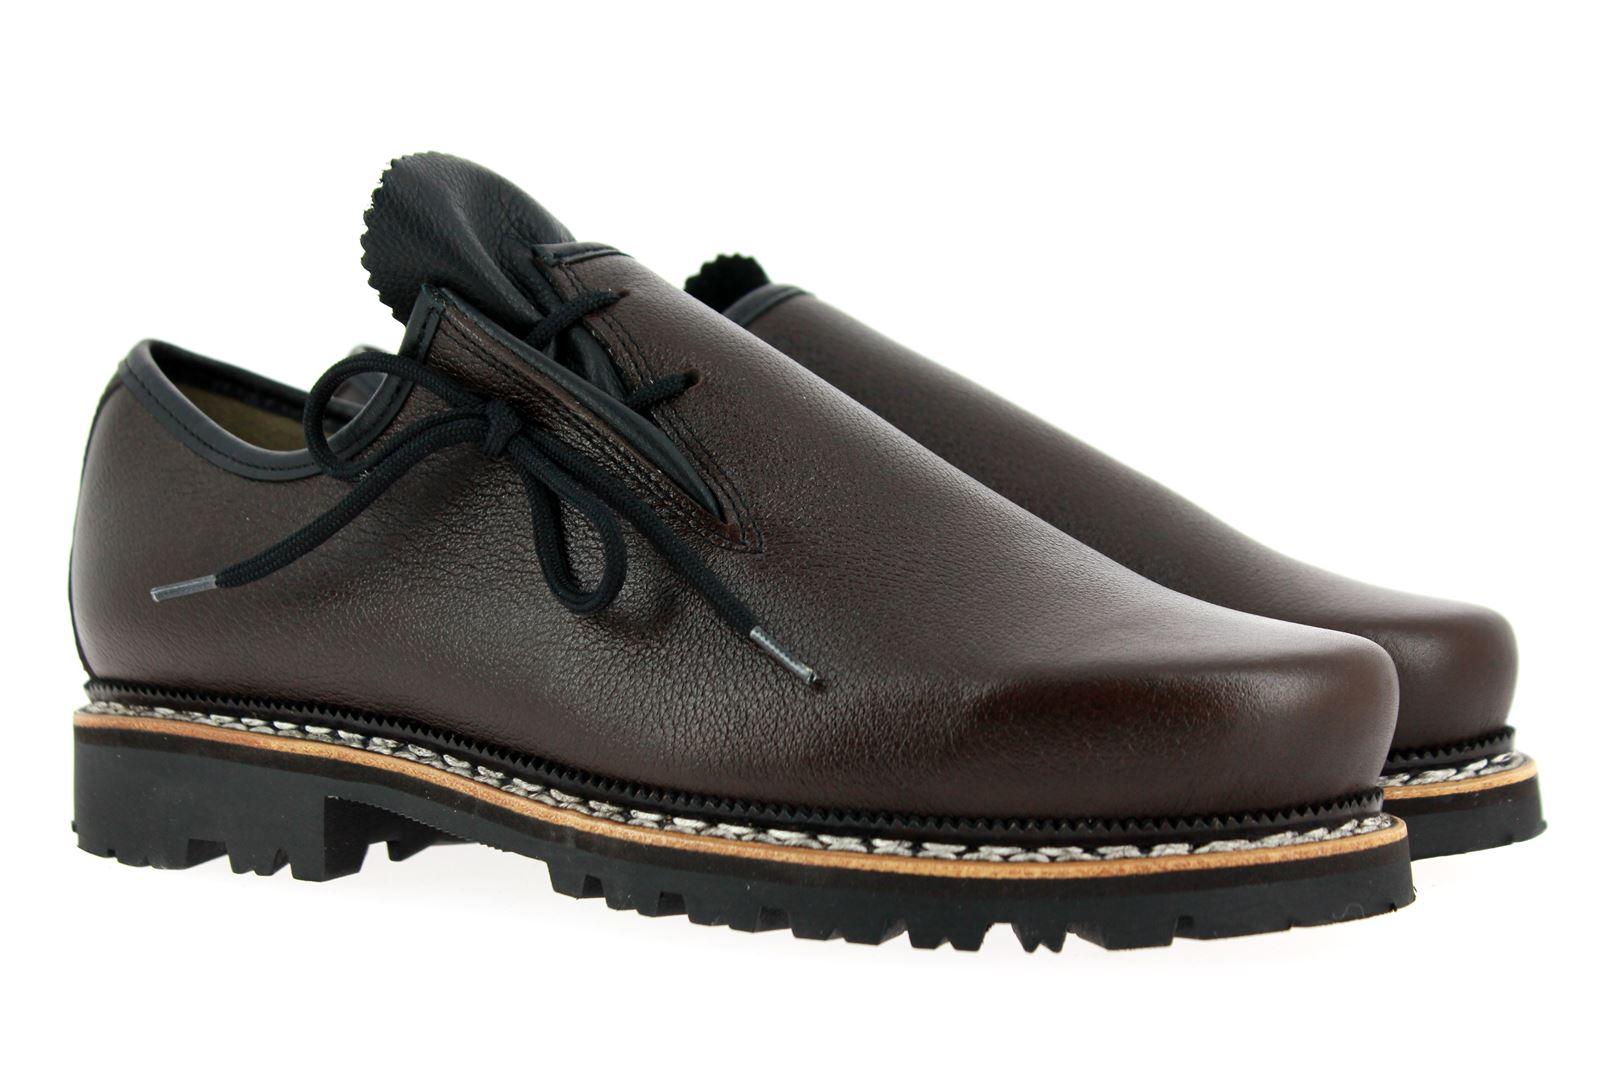 Meindl Traditional Shoe MURNAU SOFT CALF BROWN